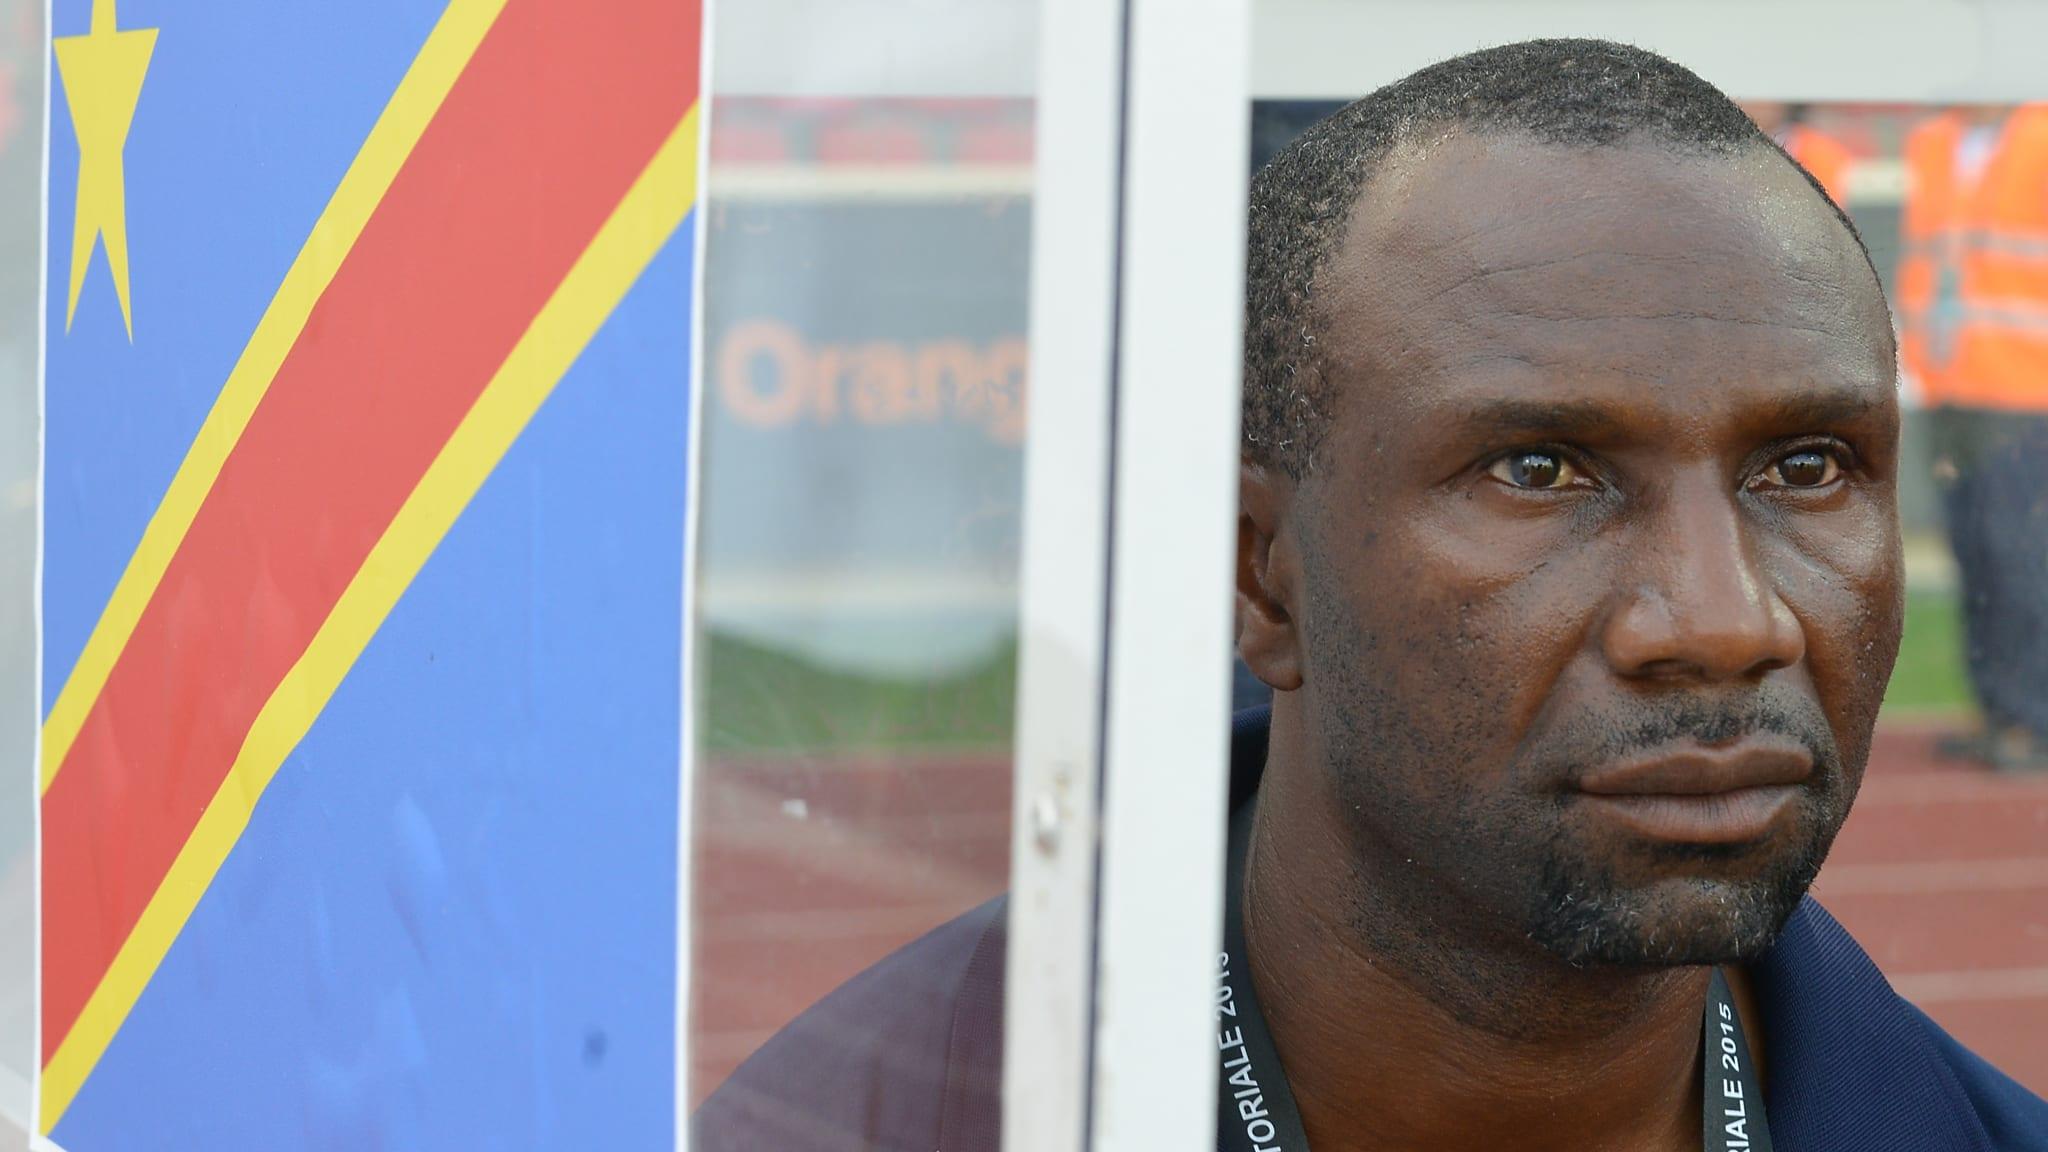 Democratic Republic of the Congo's coach Florent Ibenge